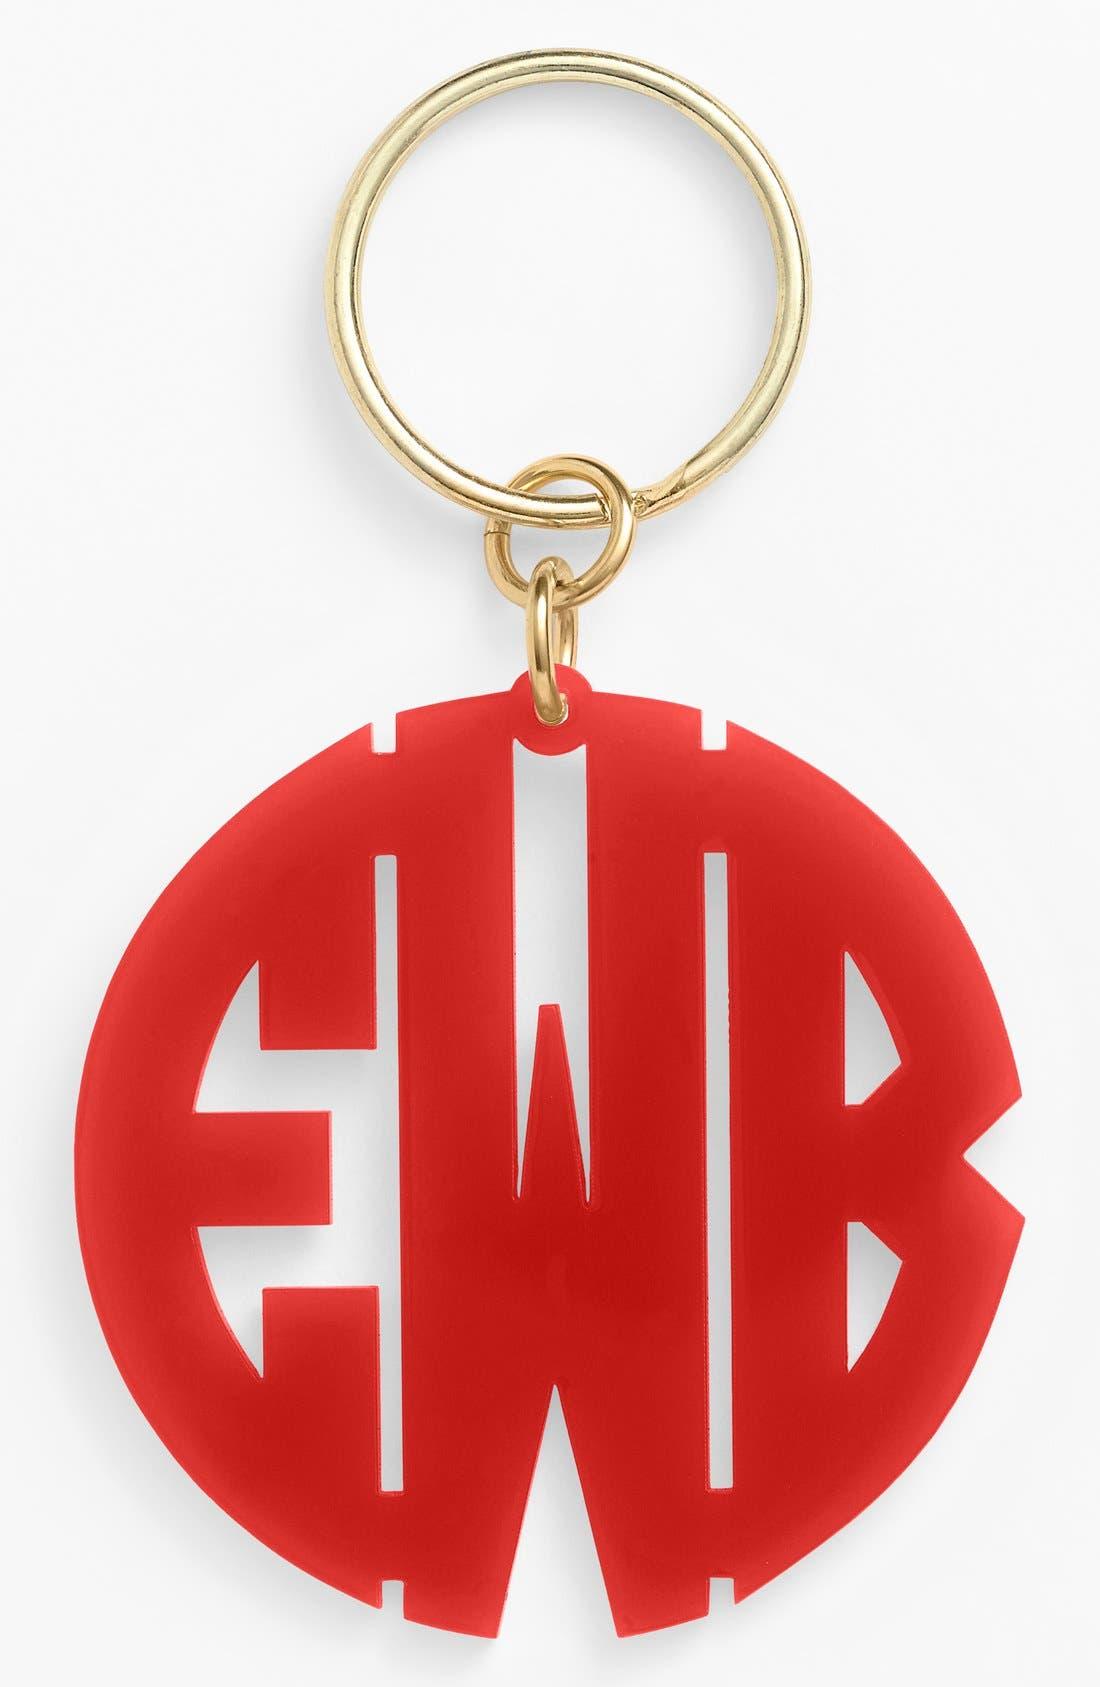 Personalized Monogram Key Chain,                             Main thumbnail 1, color,                             RUBY